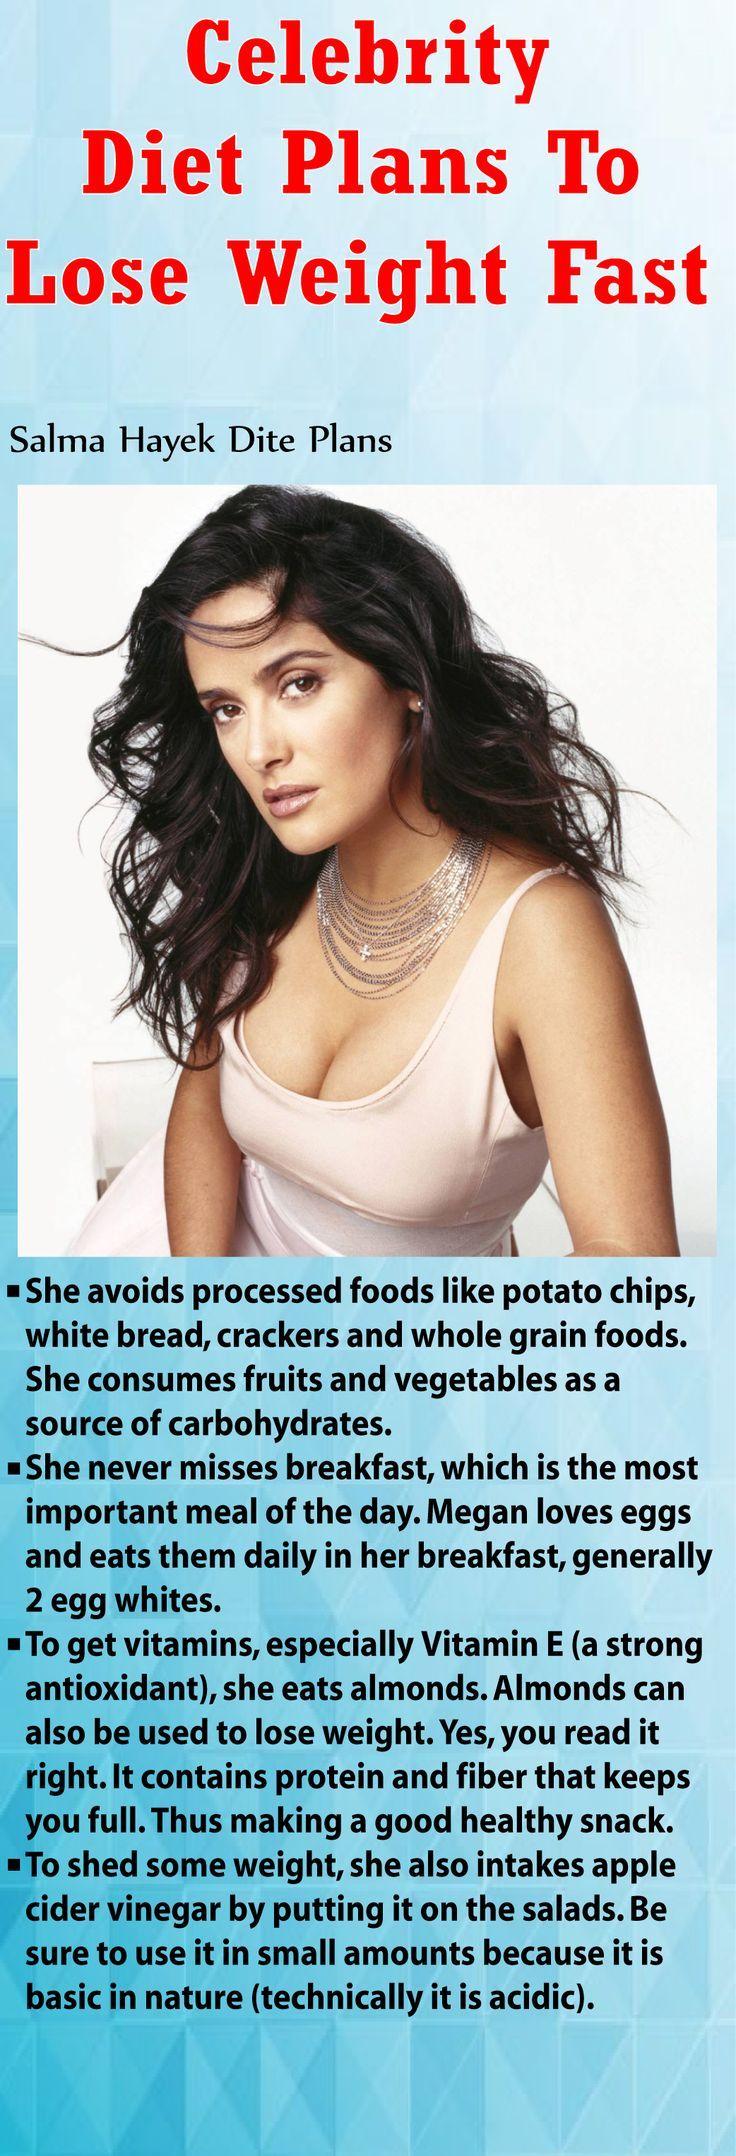 Male Celebrity Diet Plans